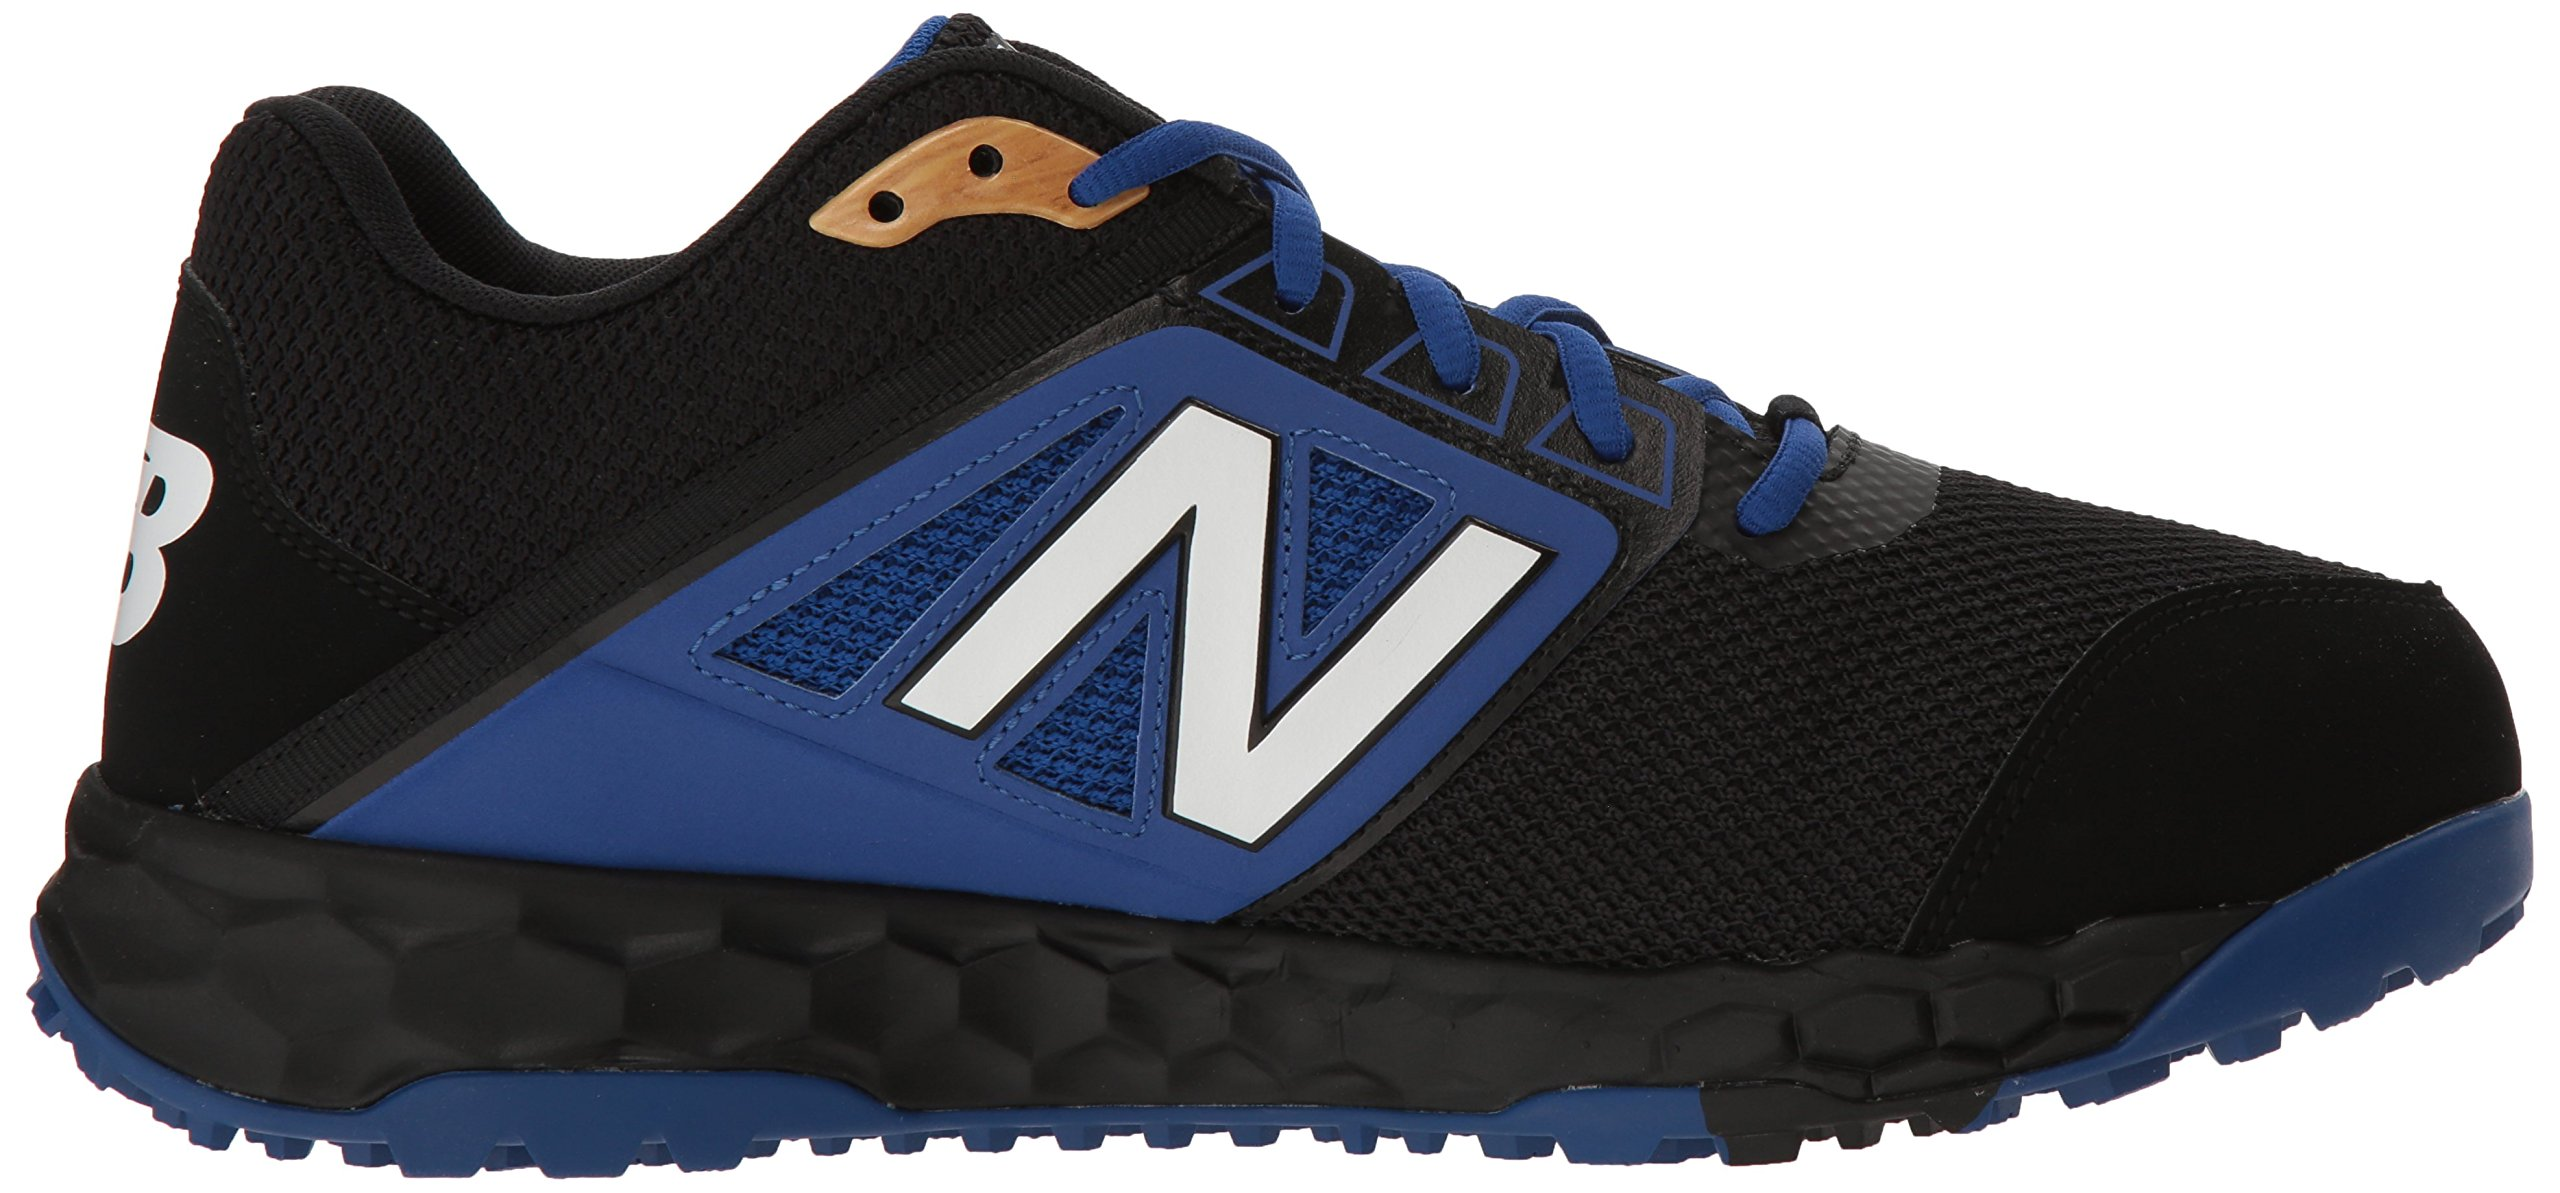 New Balance Men's 3000v4 Turf Baseball Shoe, Black/Blue, 5 D US by New Balance (Image #6)